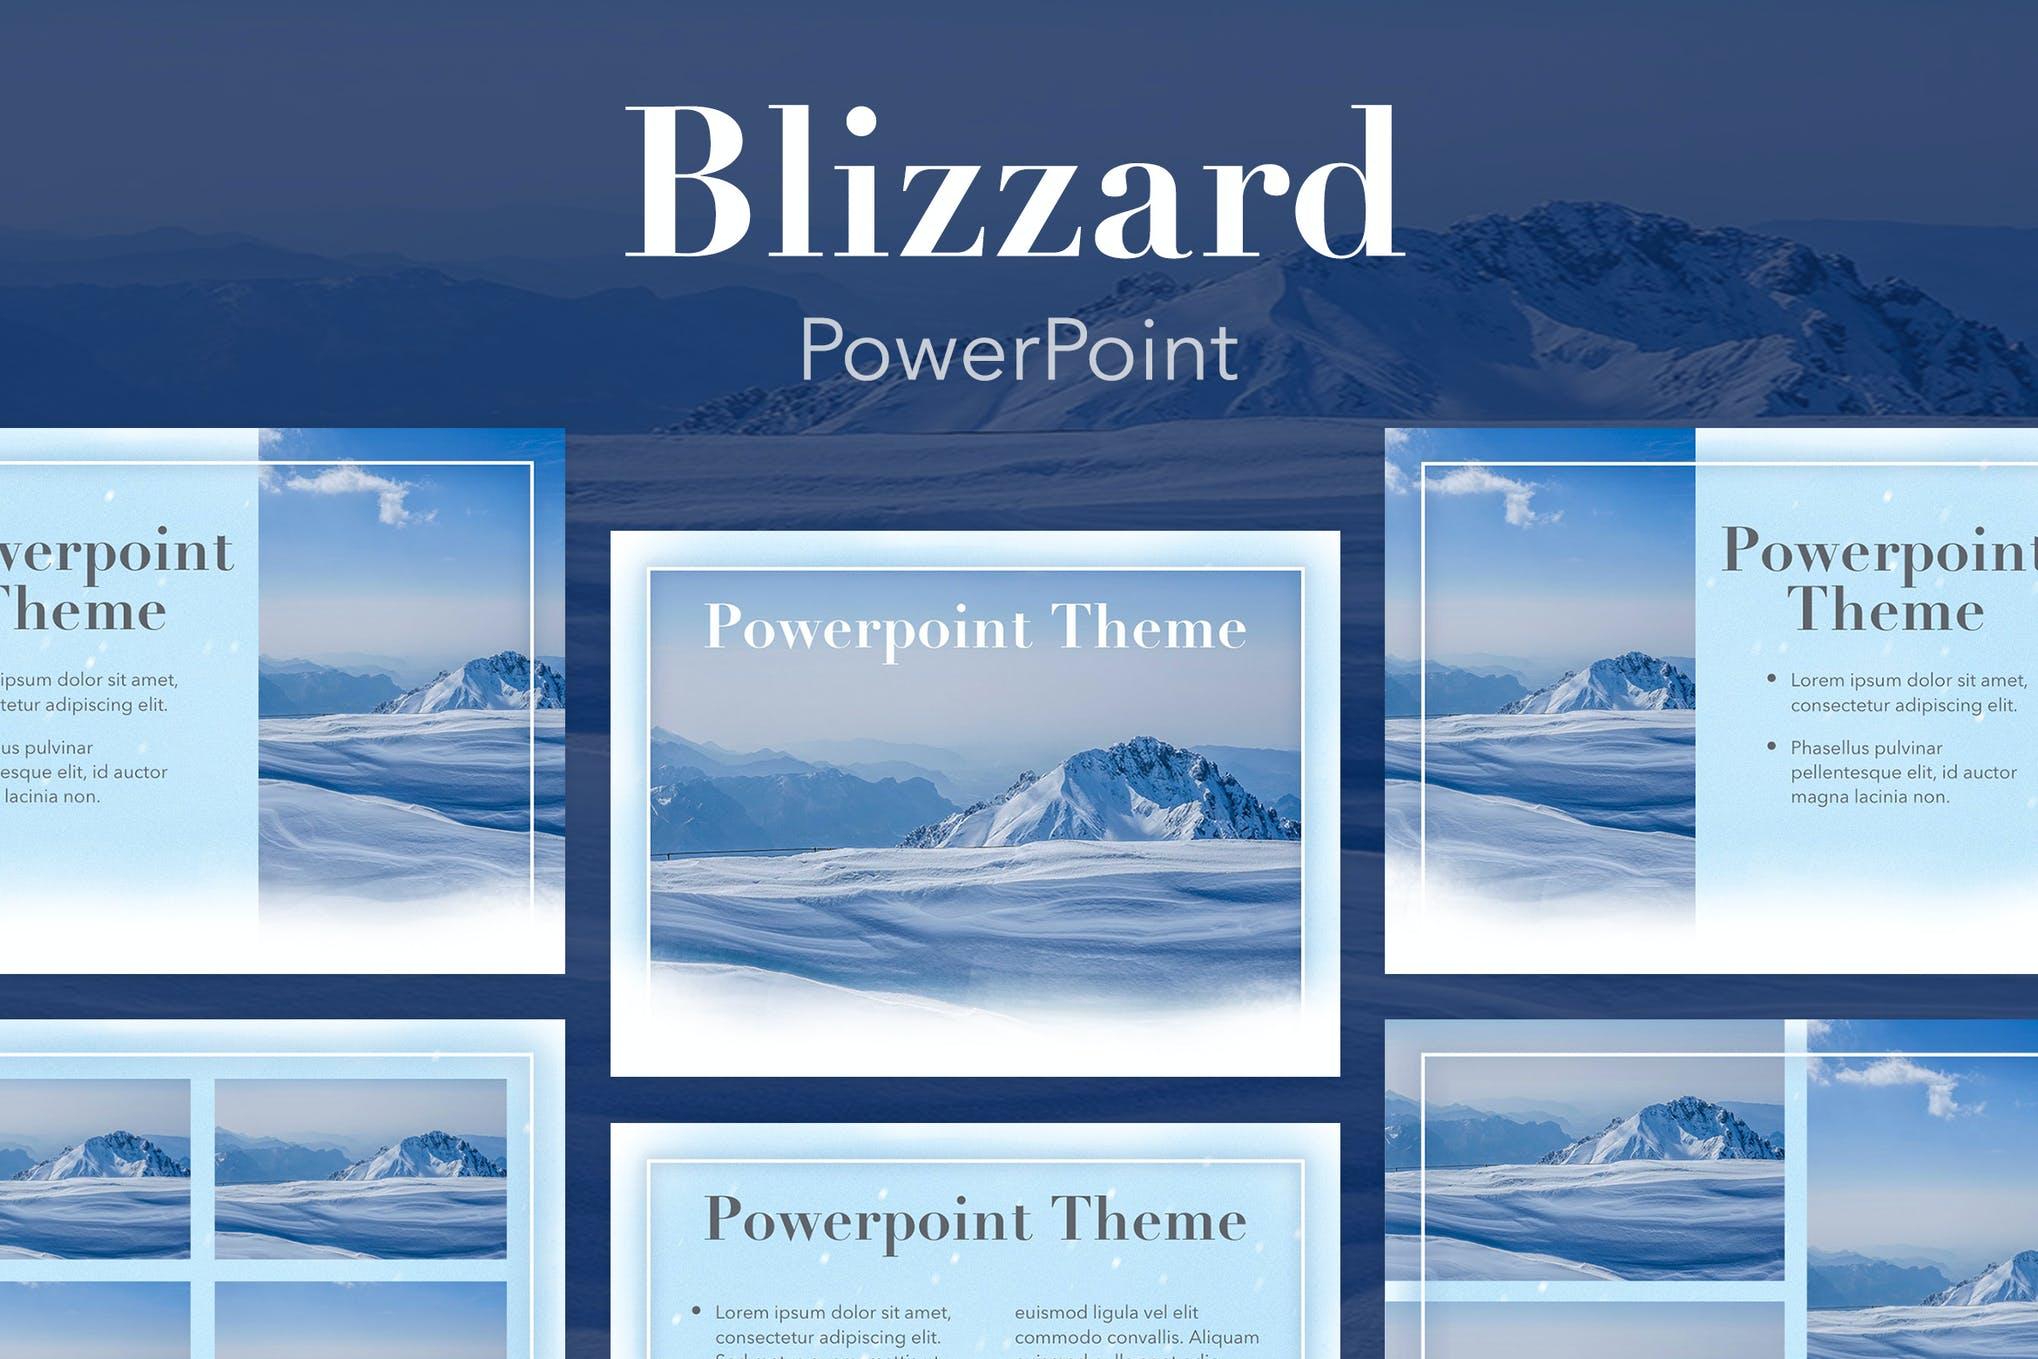 Blizzard PowerPoint Template